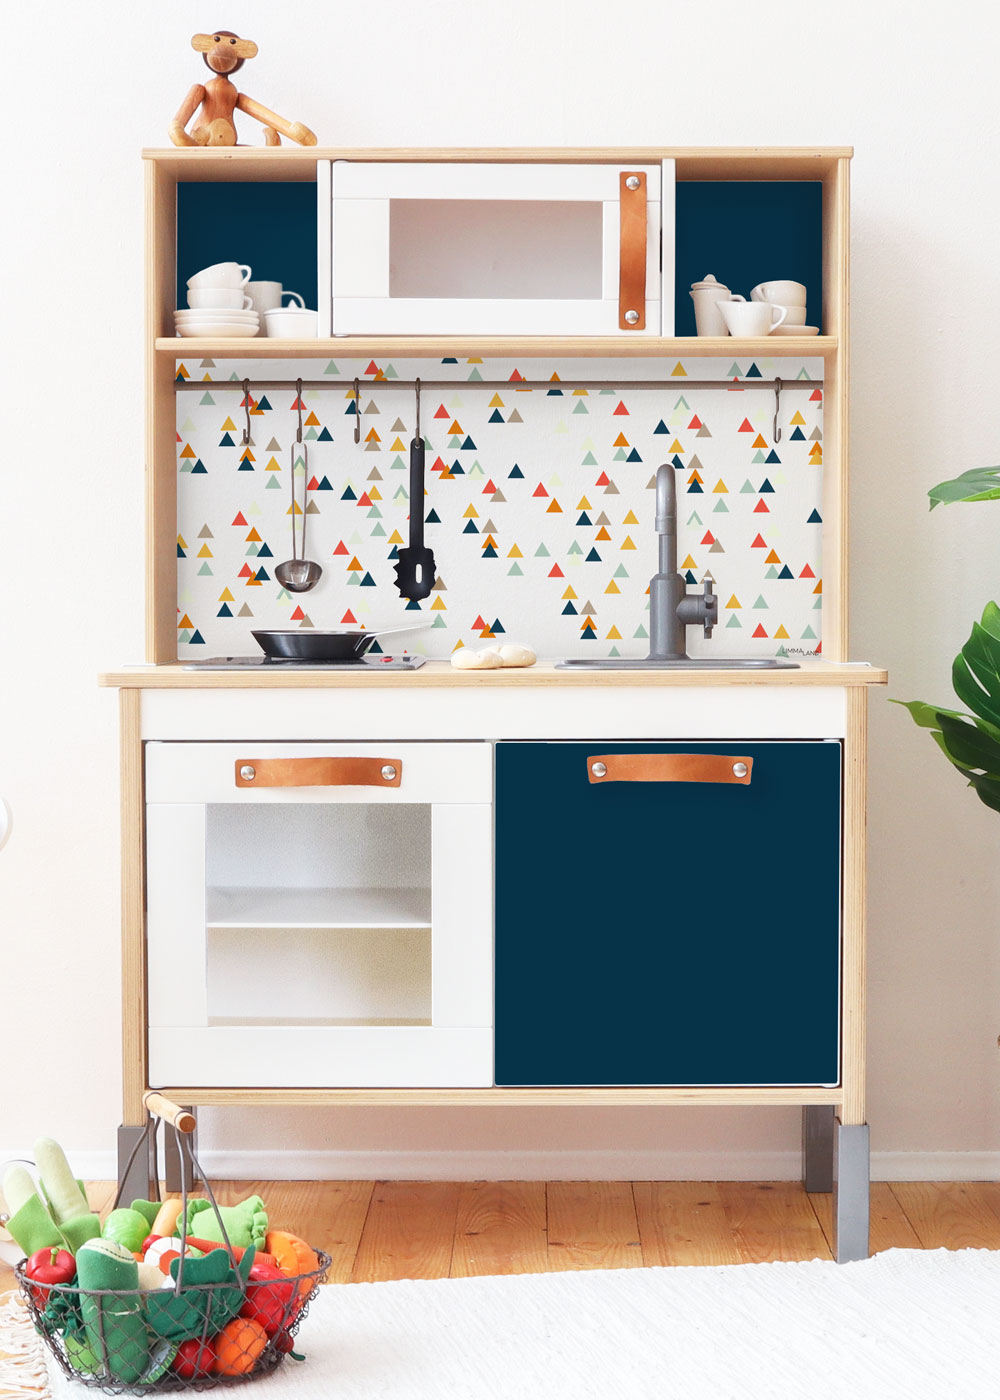 Ikea Duktig Kinderküche Trianglig Dunkelblau